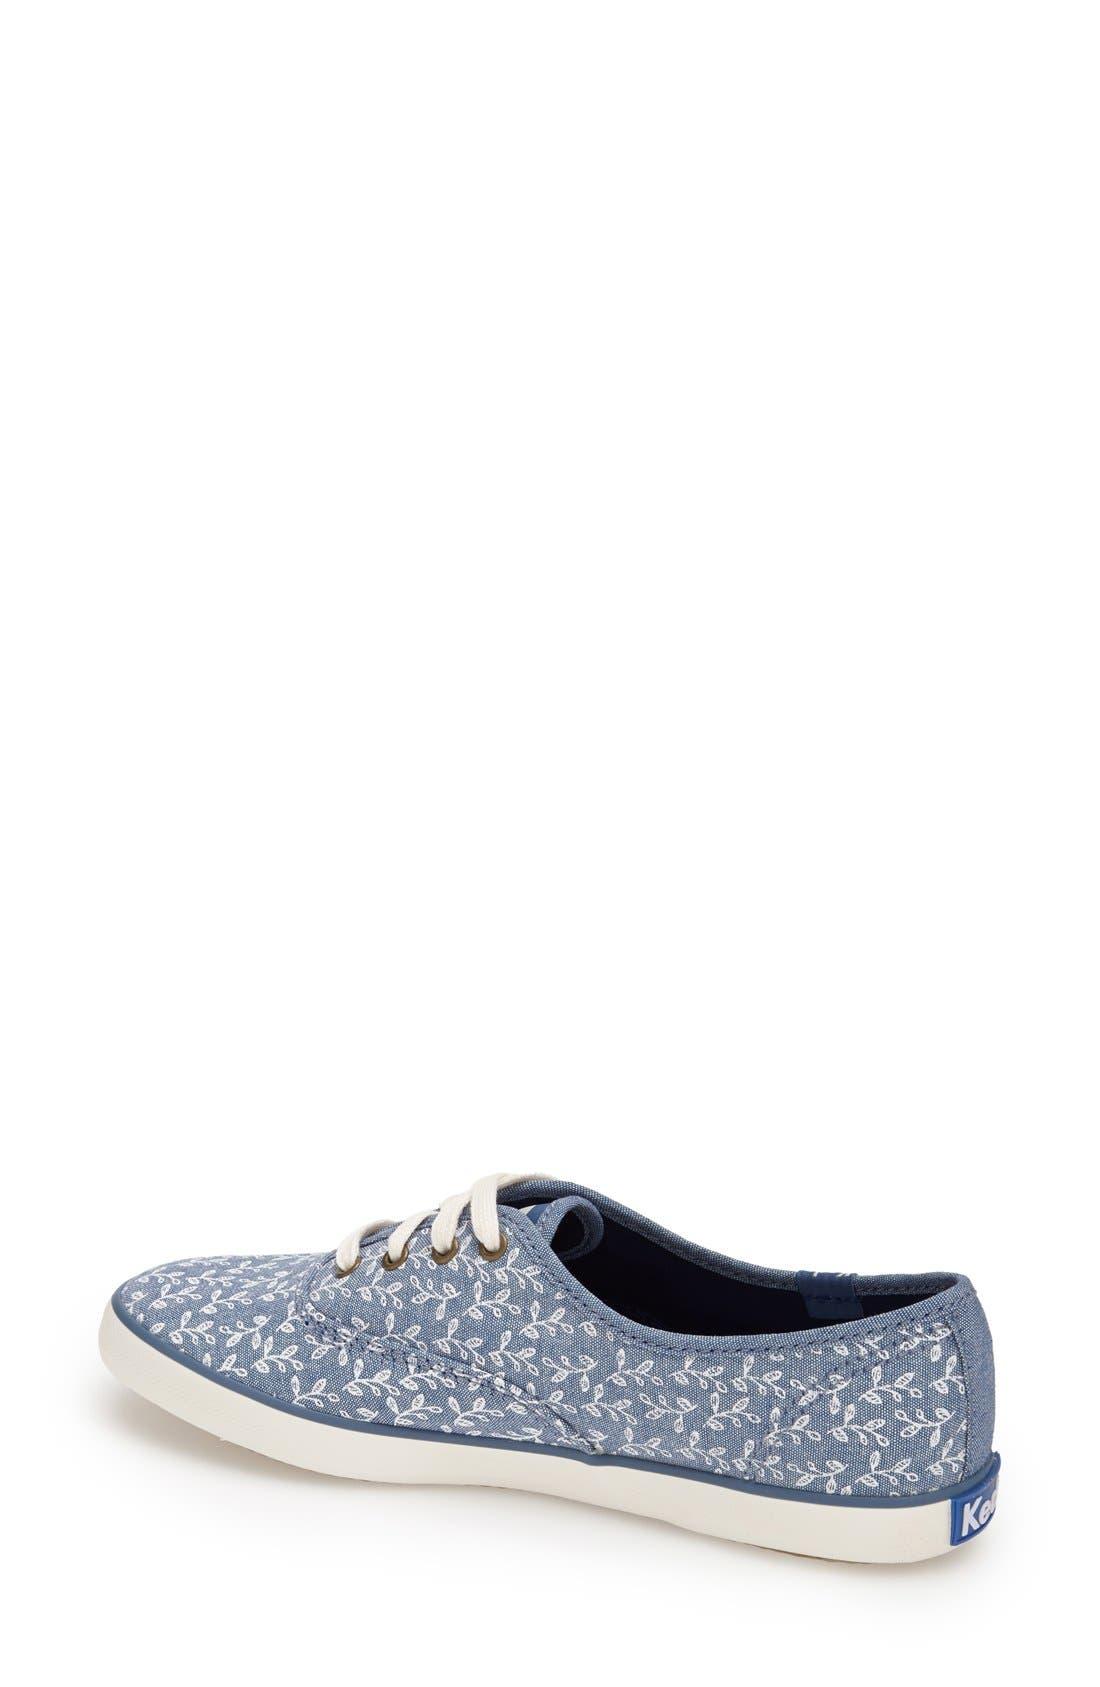 Alternate Image 2  - Keds® 'Champion - Botanical' Sneaker (Women)